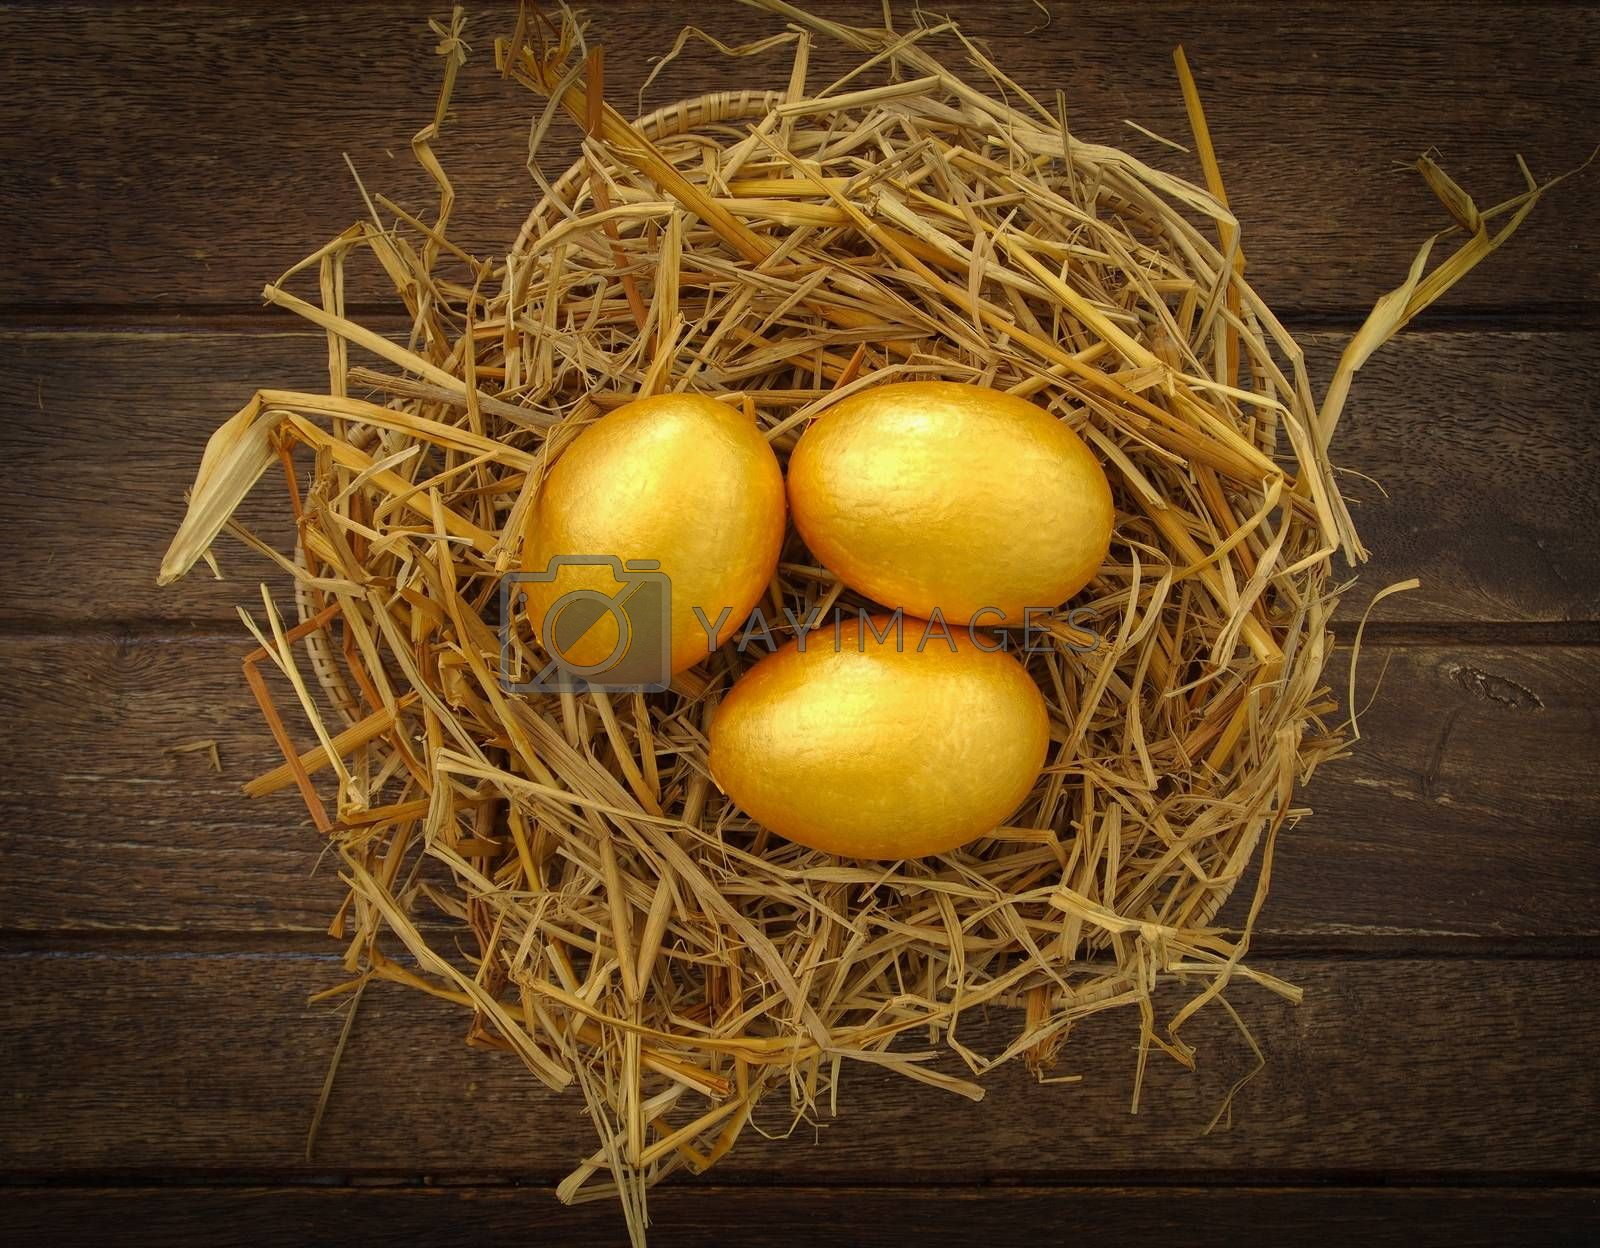 gold eggs by Phonlawat